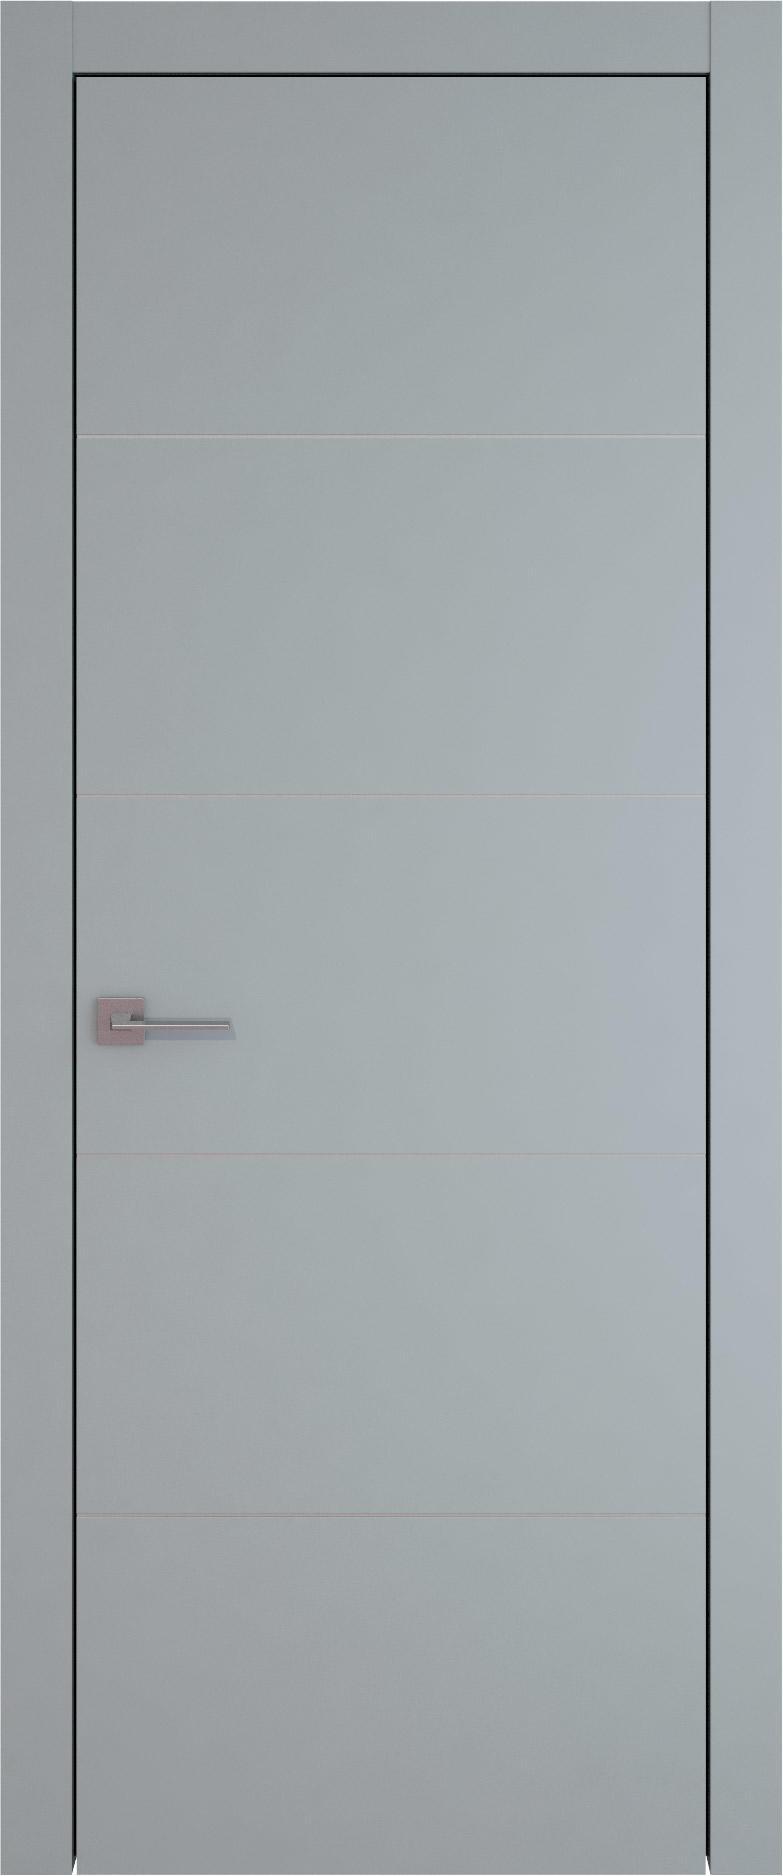 Tivoli Д-3 цвет - Серебристо-серая эмаль (RAL 7045) Без стекла (ДГ)